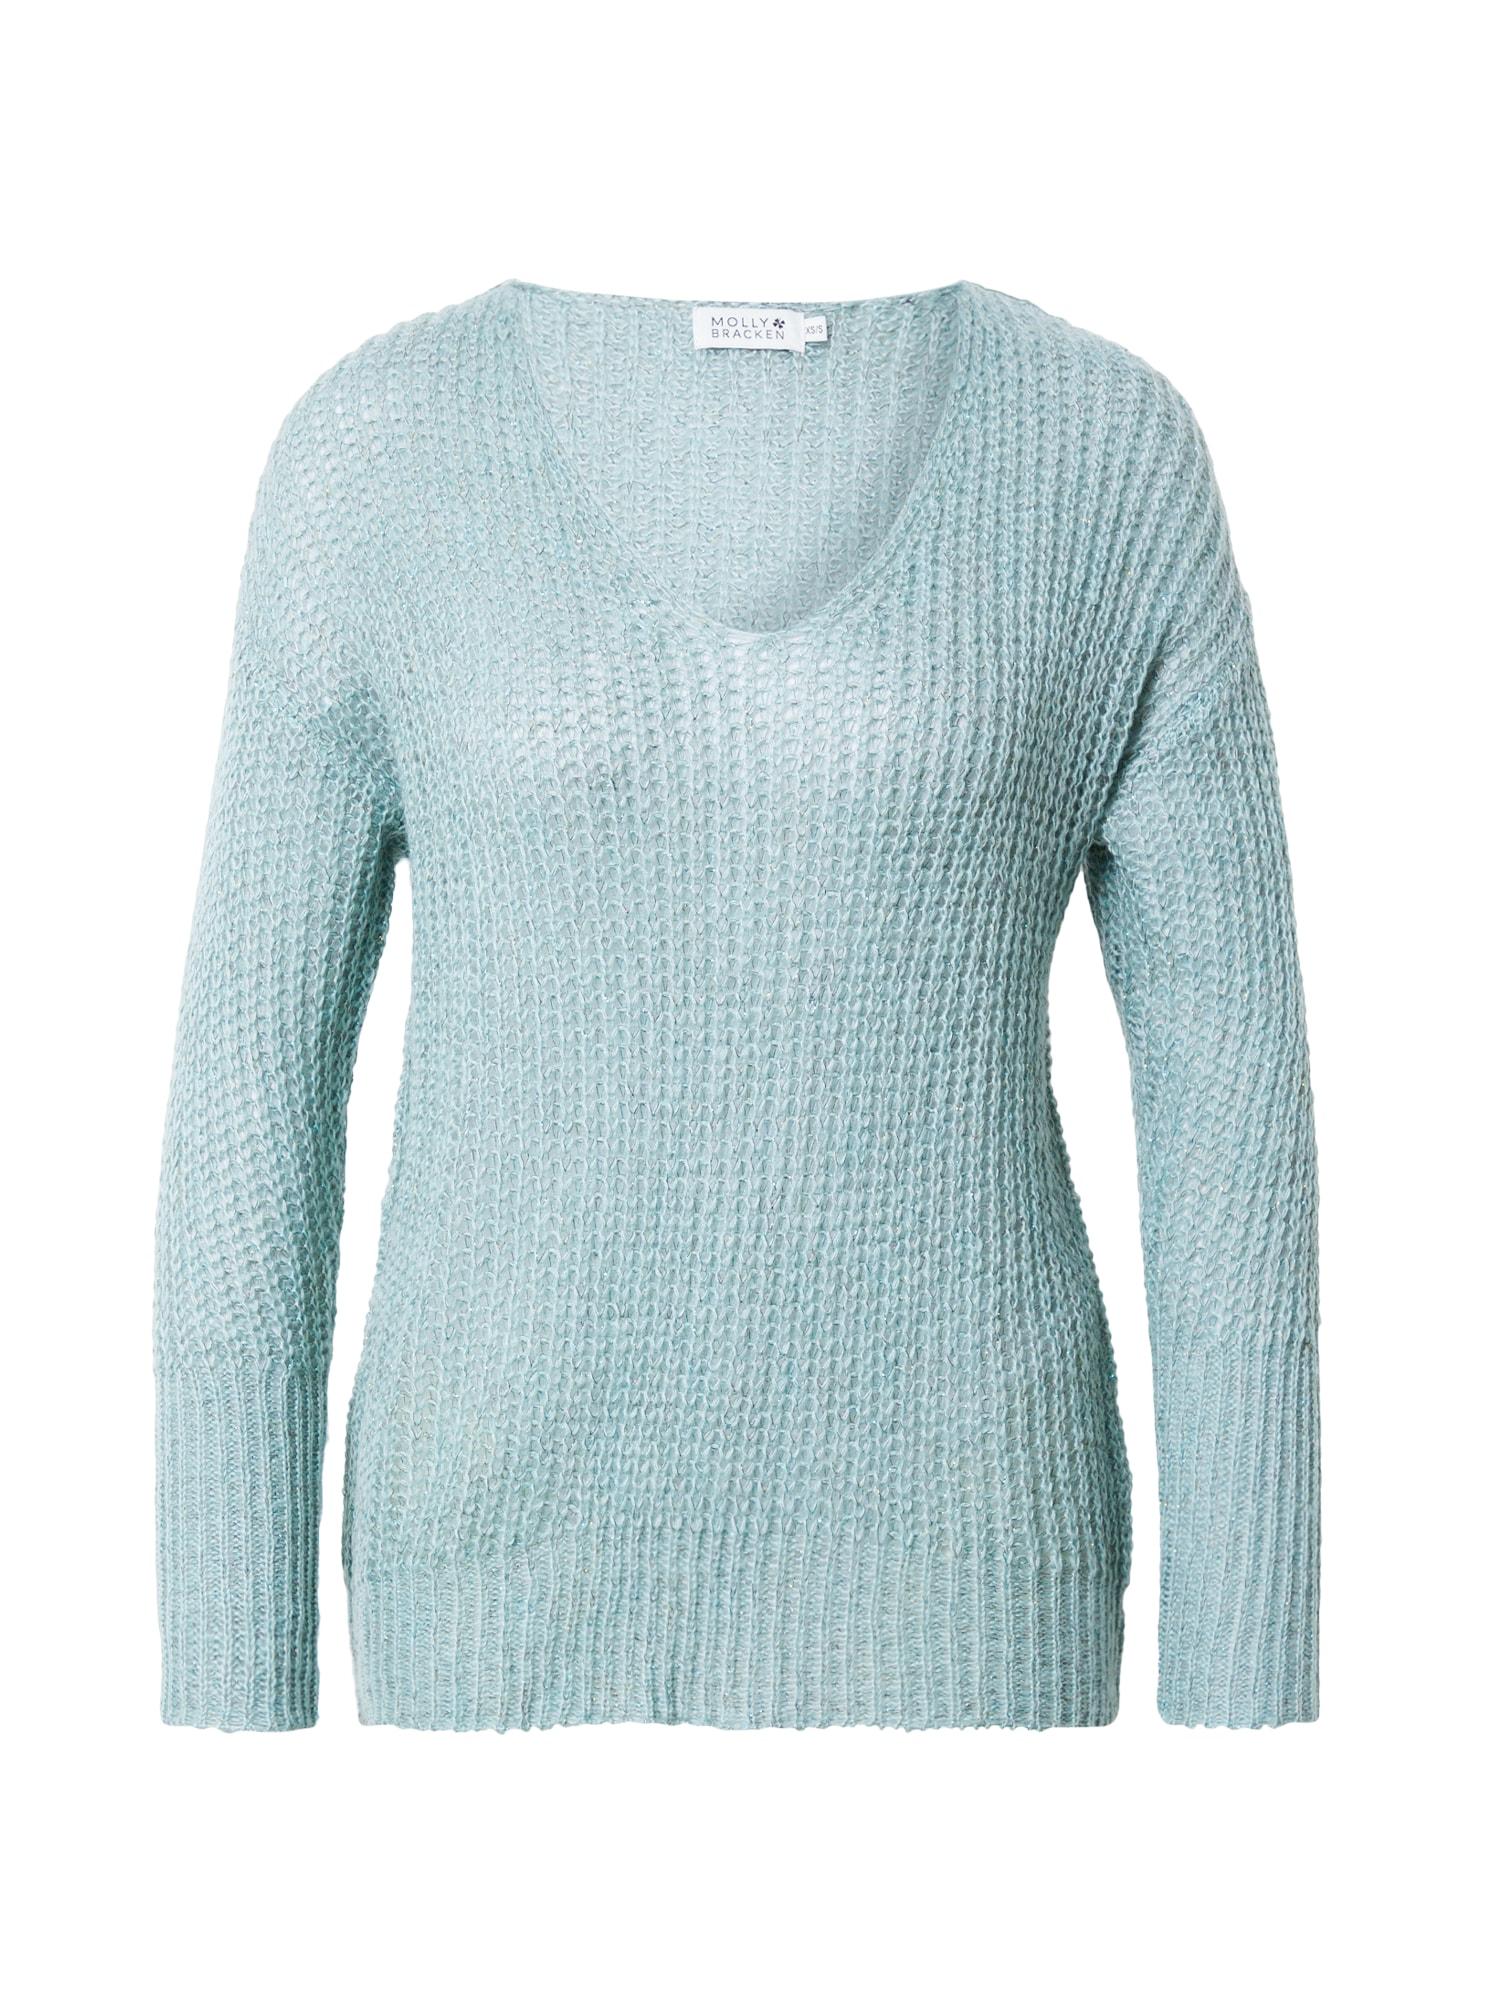 Molly BRACKEN Megztinis mėtų spalva